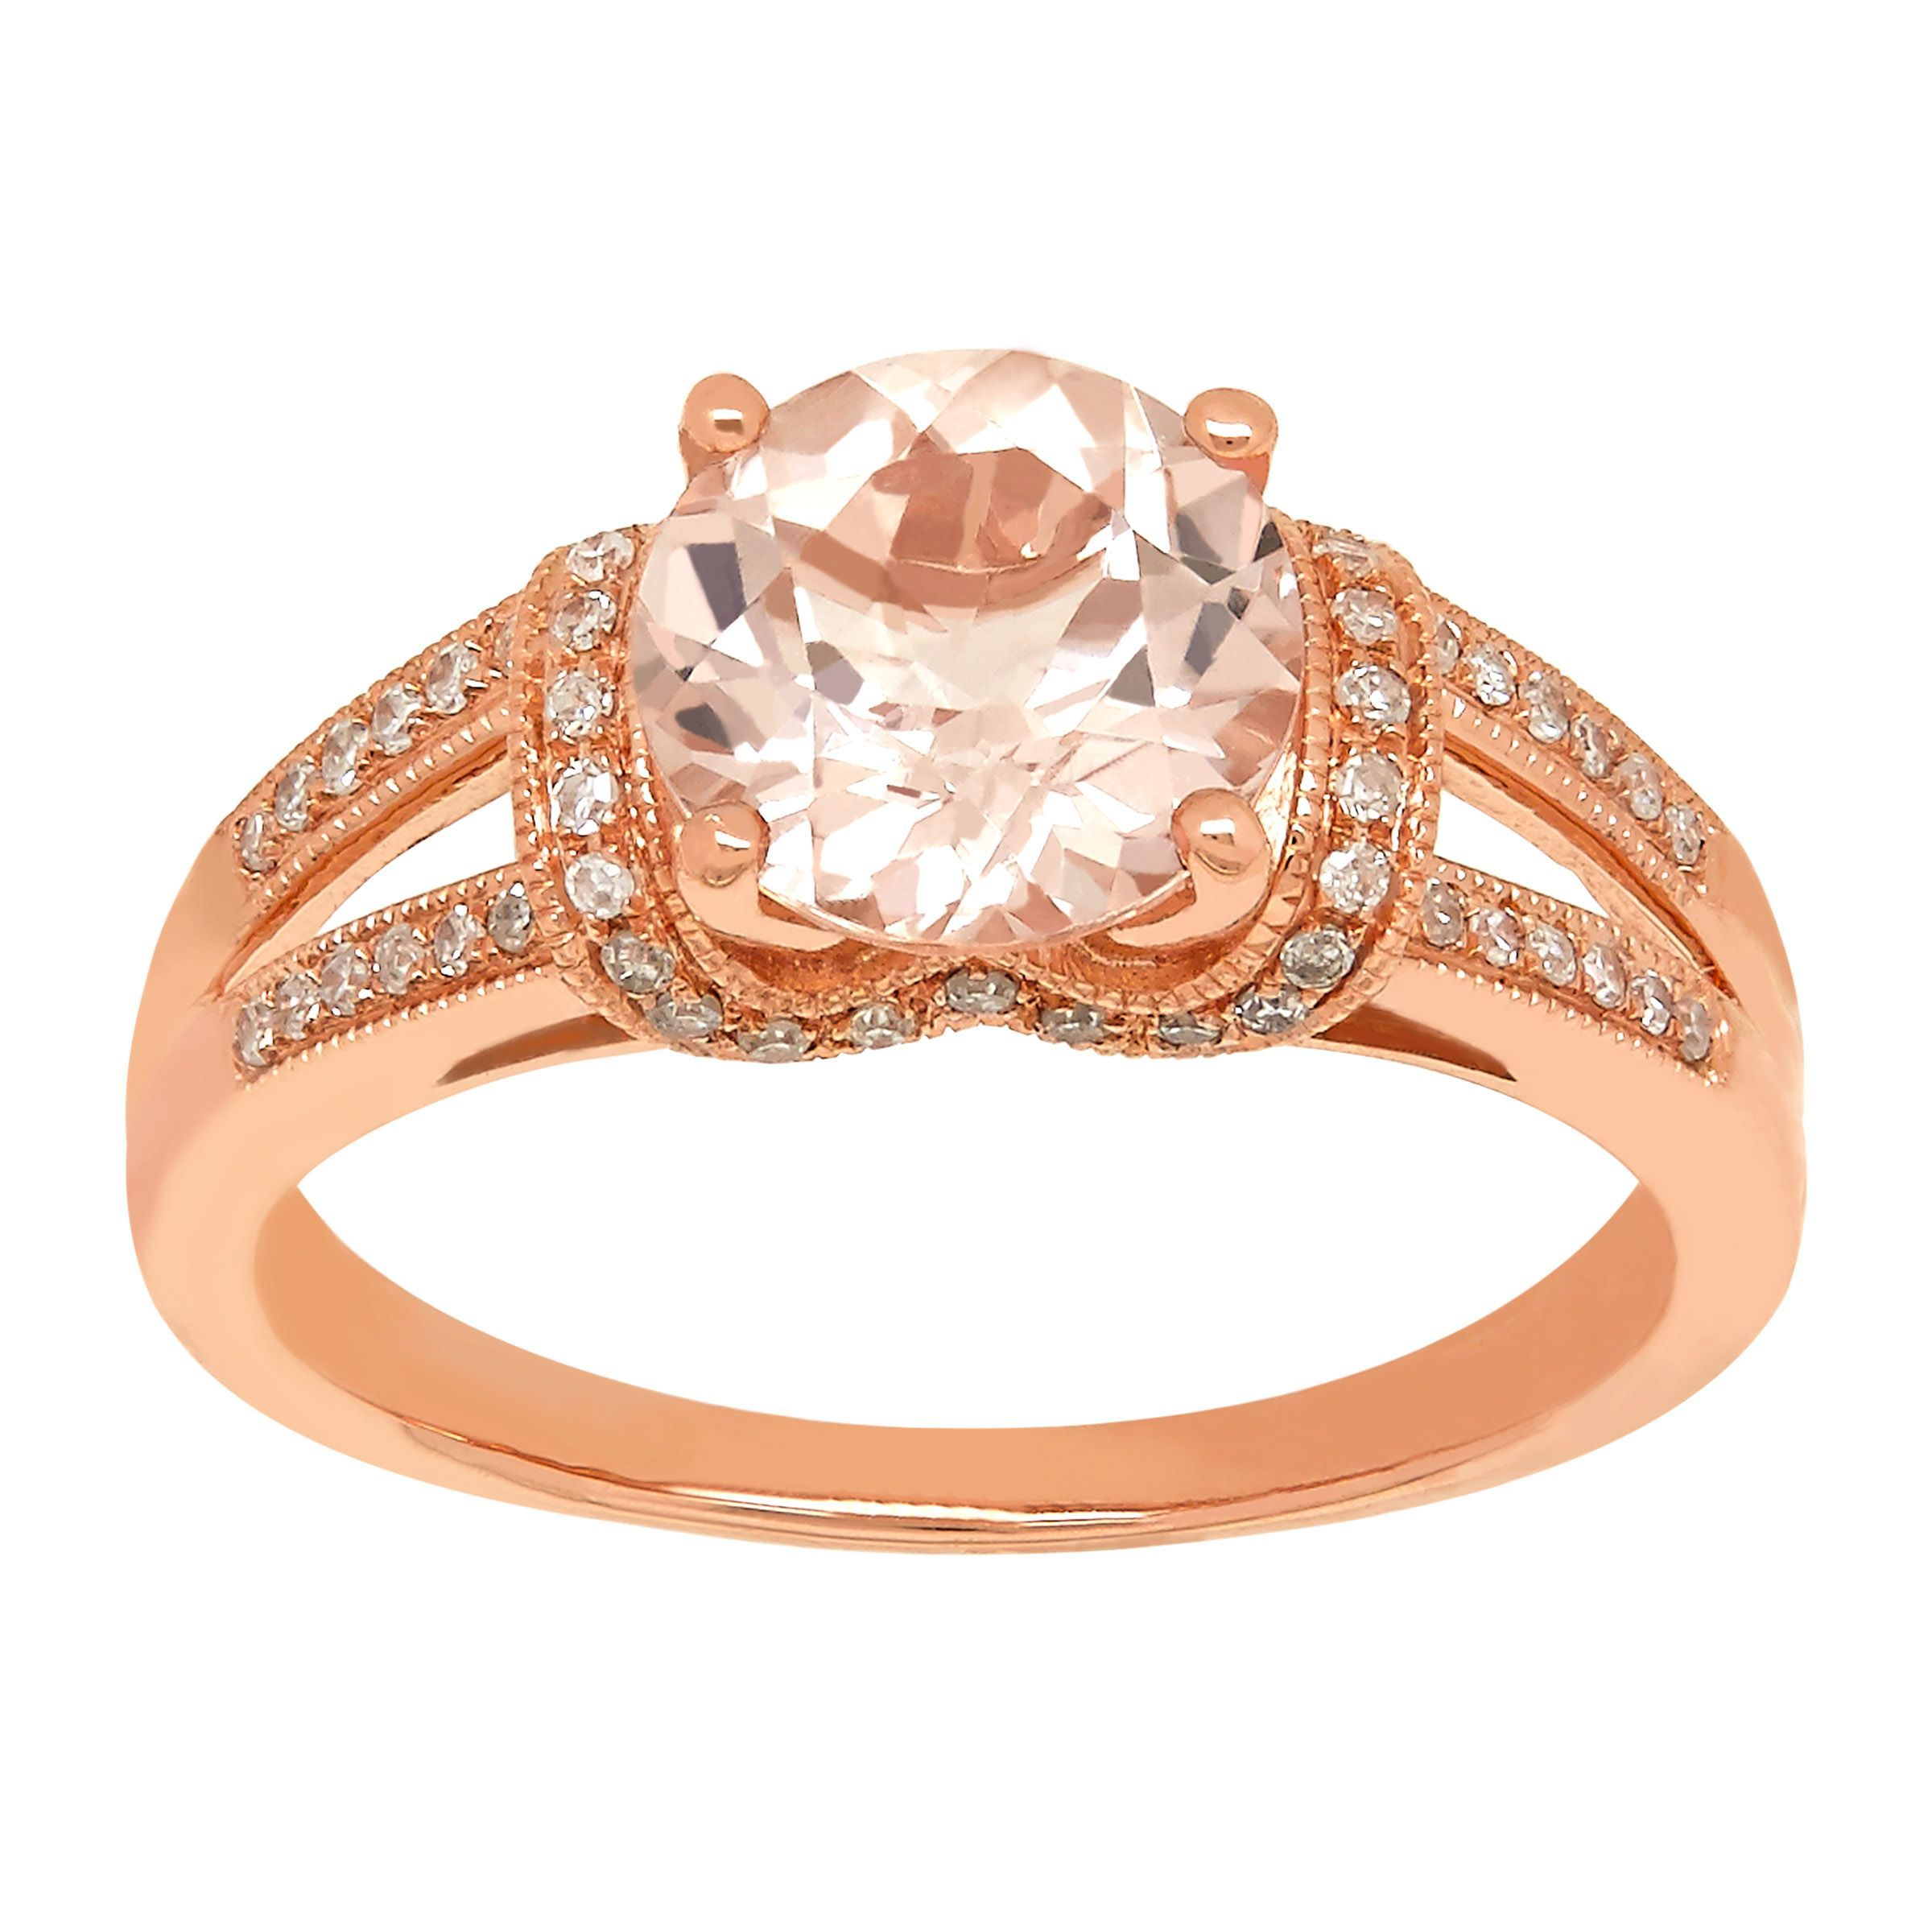 1 7 8 ct natural morganite 1 5 ct diamond ring in 14k. Black Bedroom Furniture Sets. Home Design Ideas